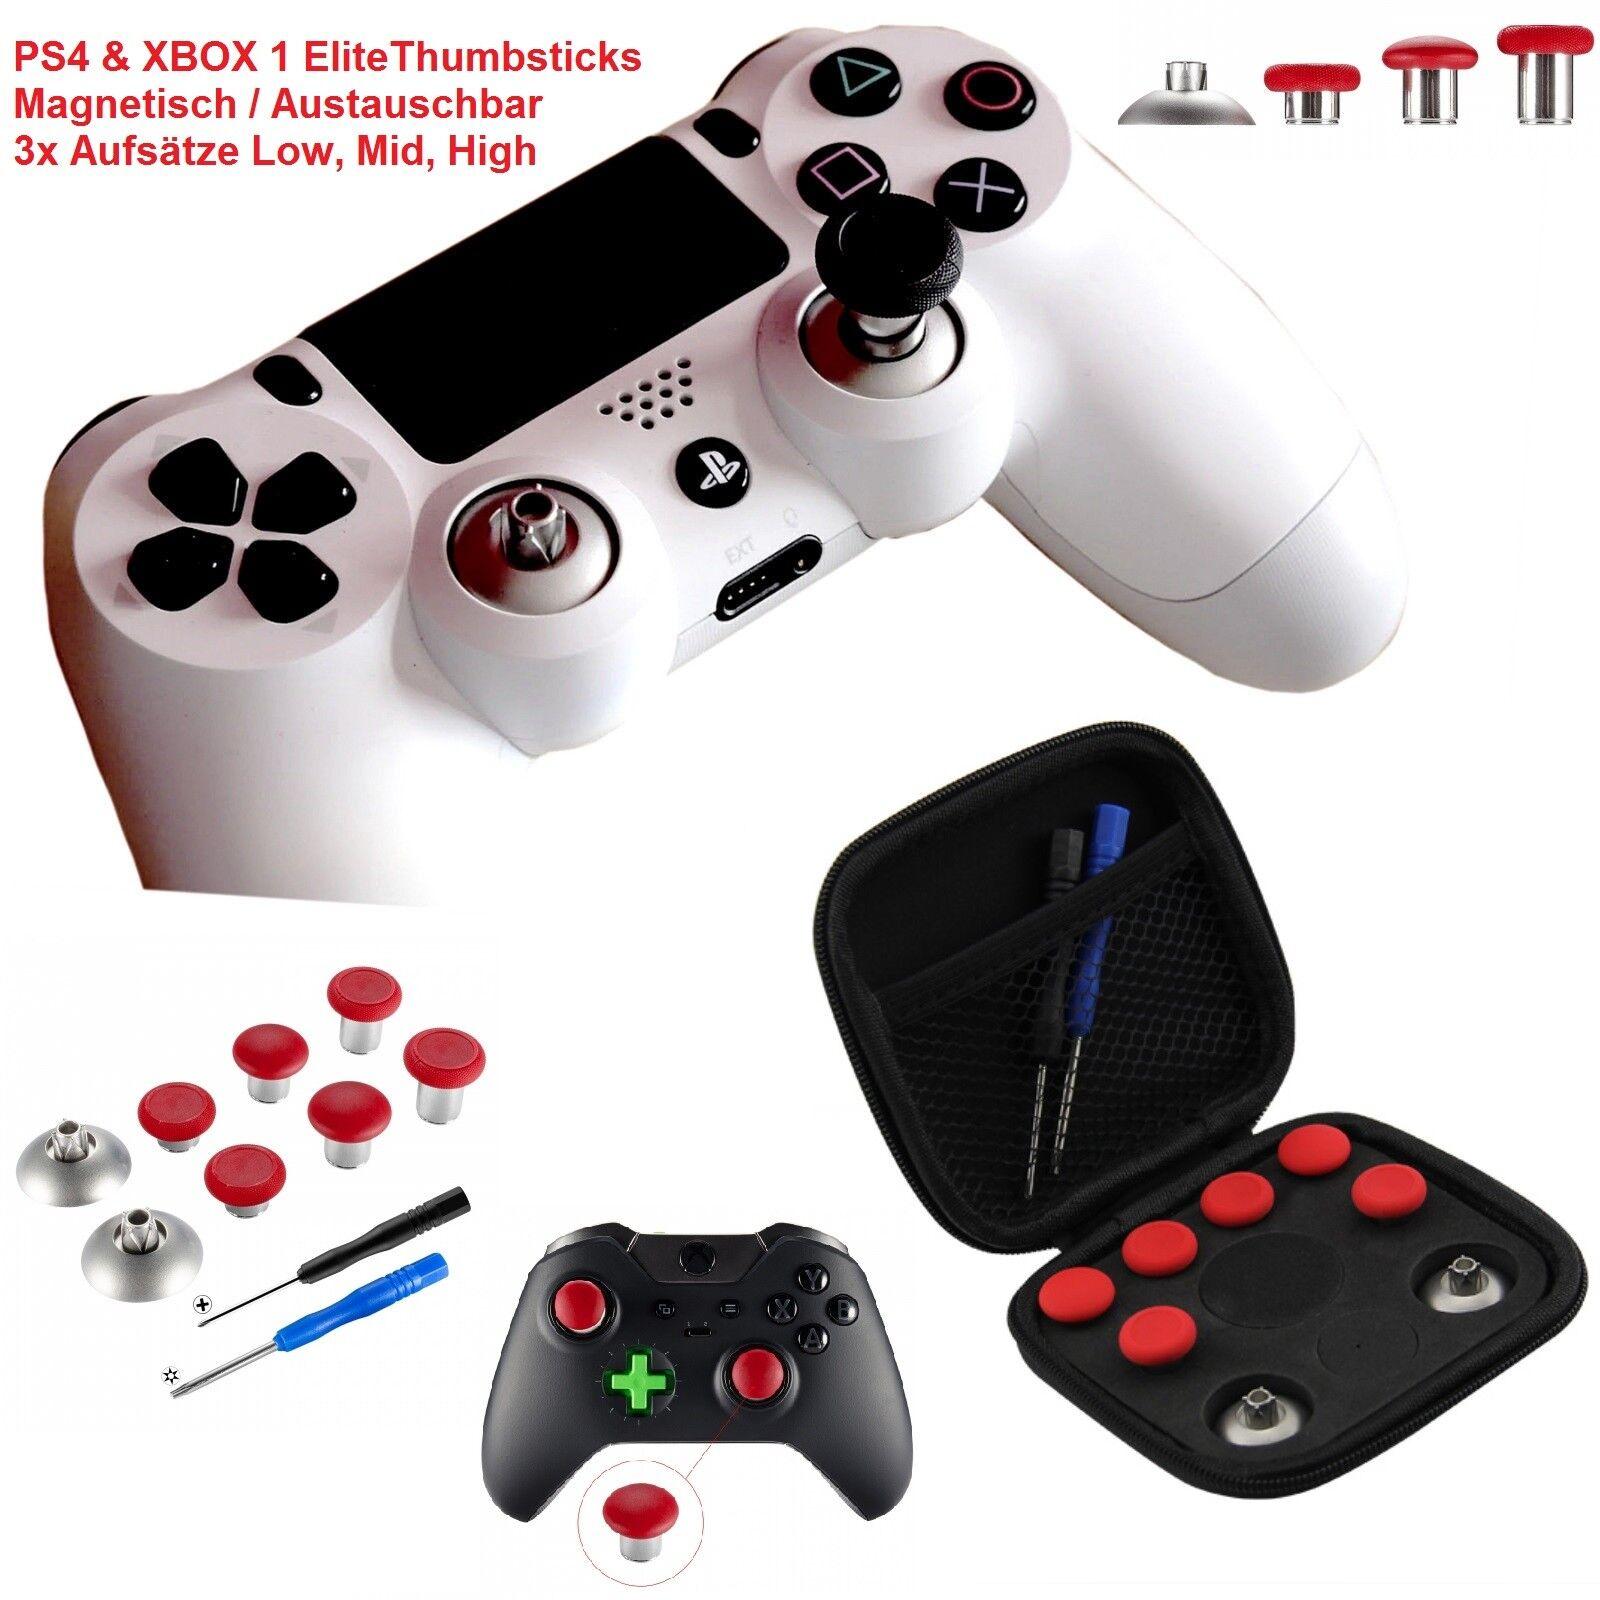 Elite Thumbstick Modding Set PS4 & Xbox 1 Controller Magnetic Interchangeable